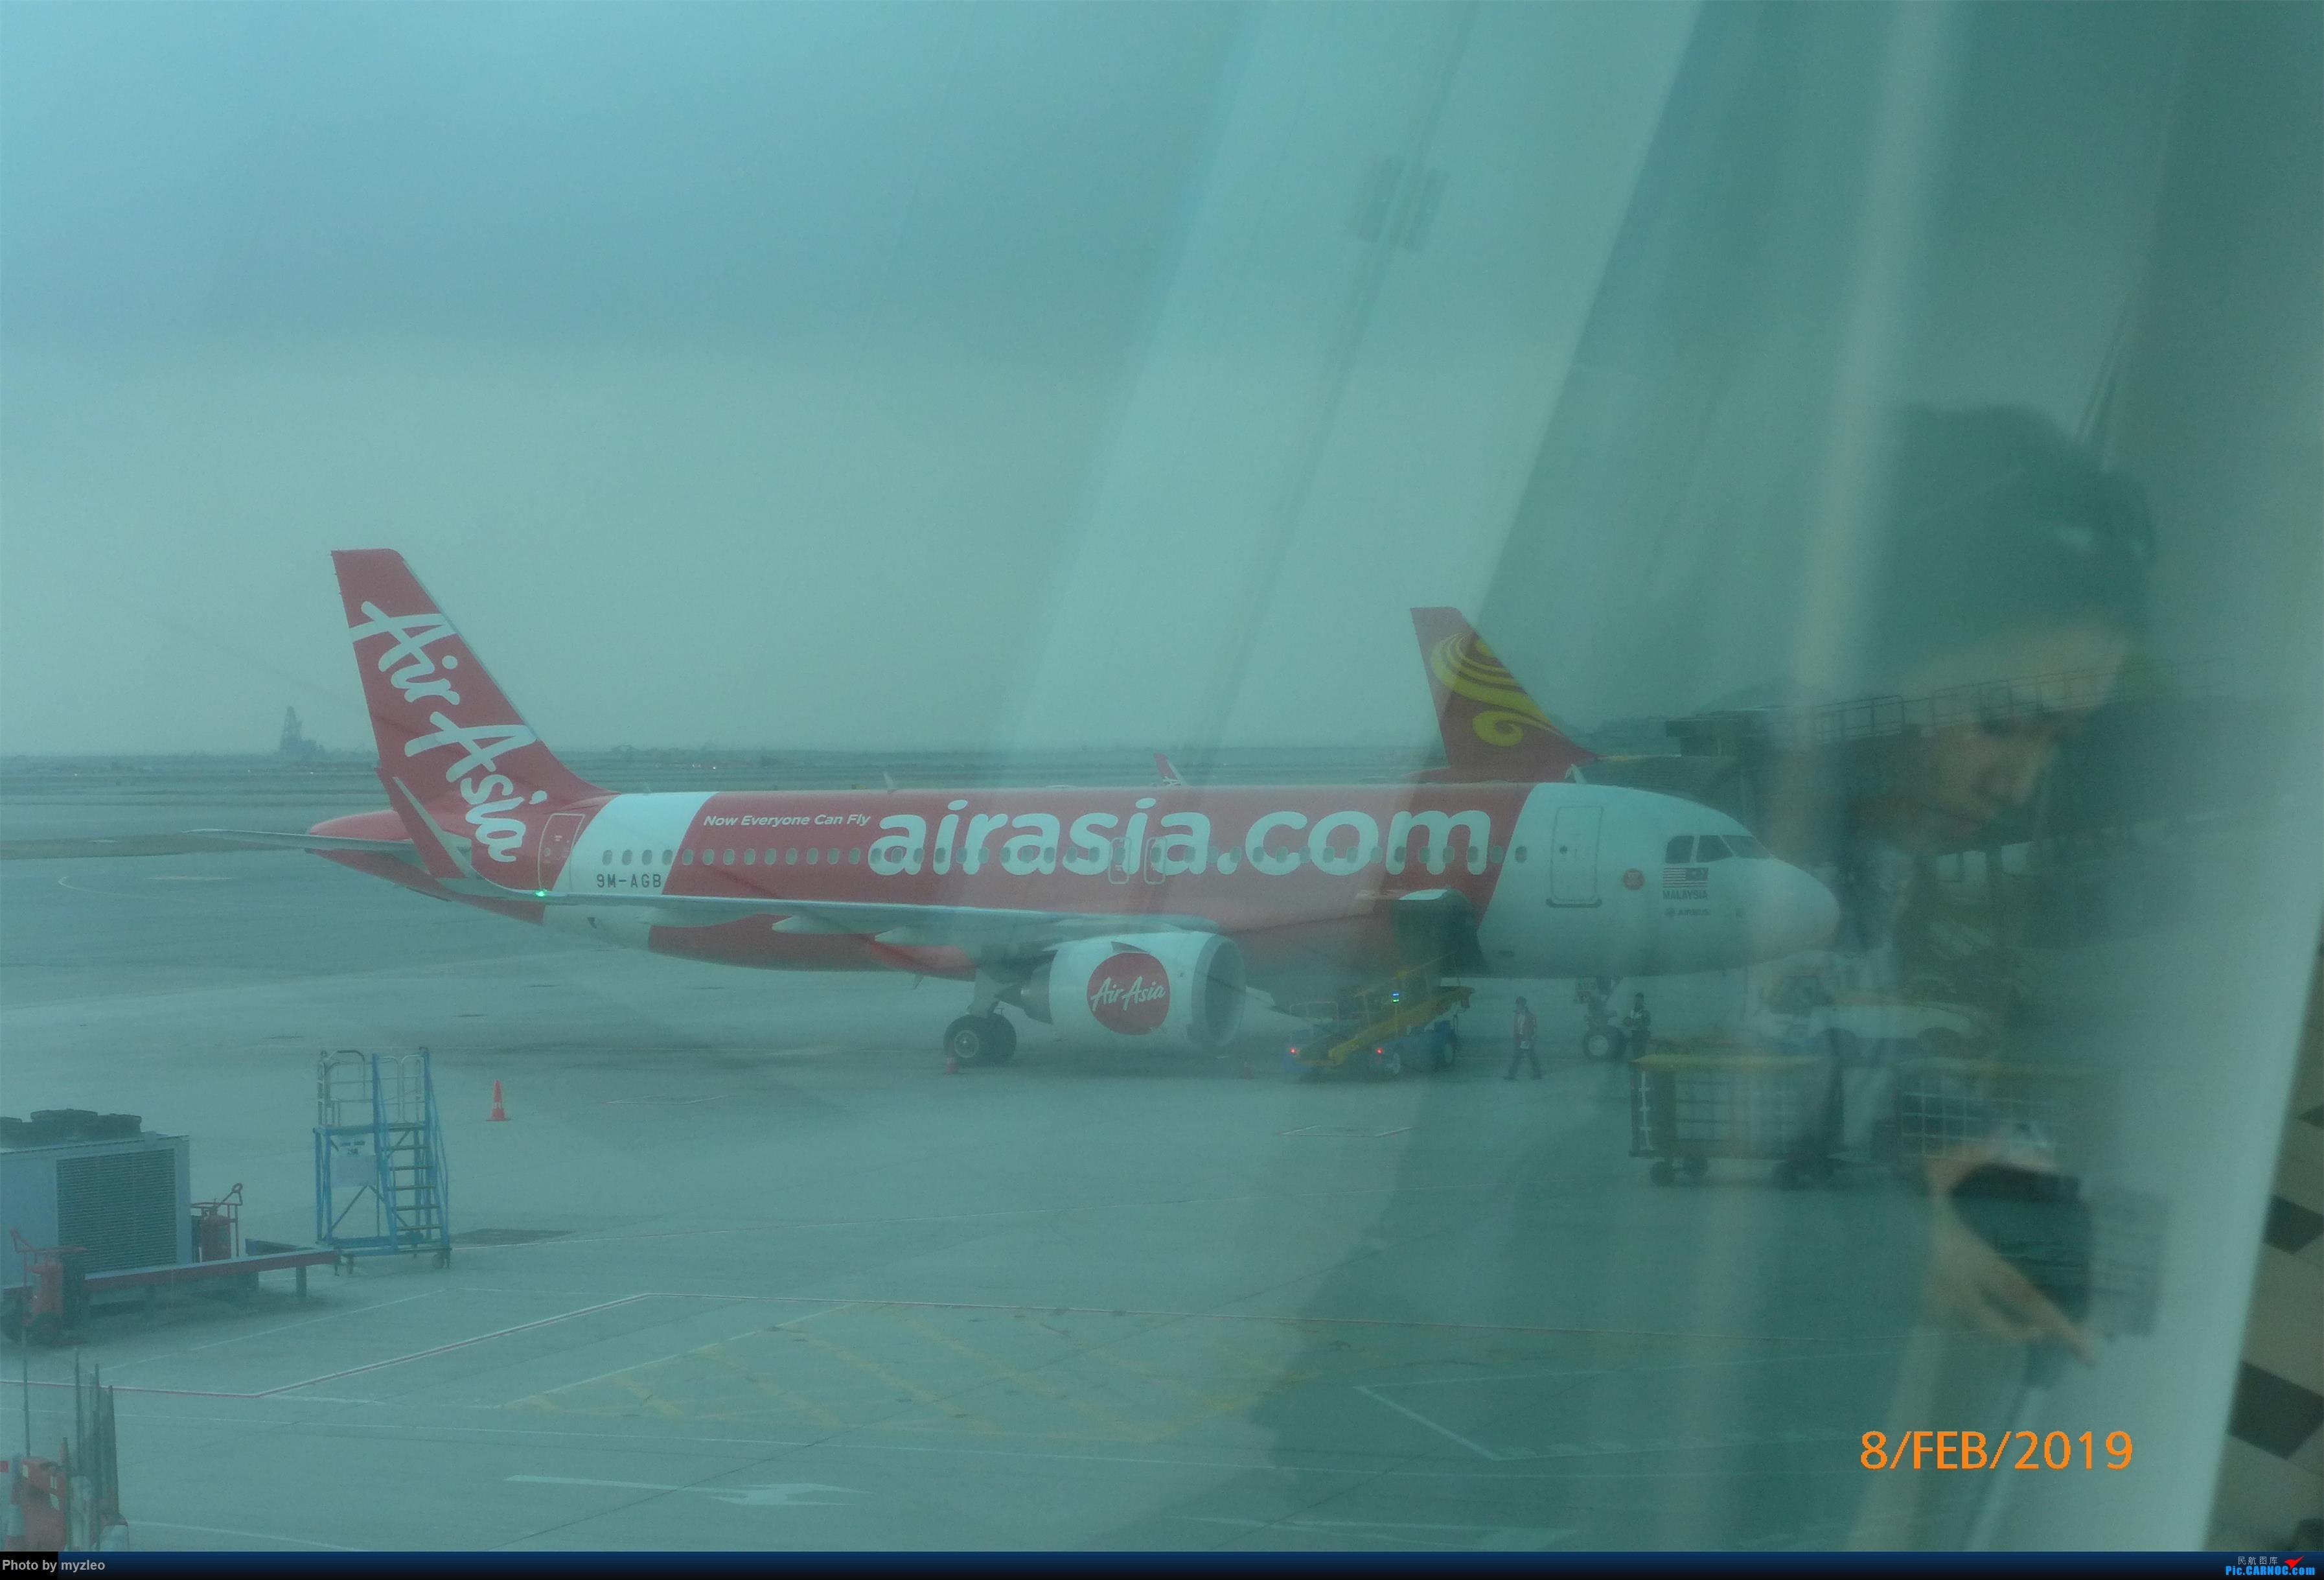 Re:[原创]【myzleo的游记4.5】十年之约(5)在香港的最后一天,搭乘港航333回沪 AIRBUS A320-200 9M-AGB 中国香港国际机场